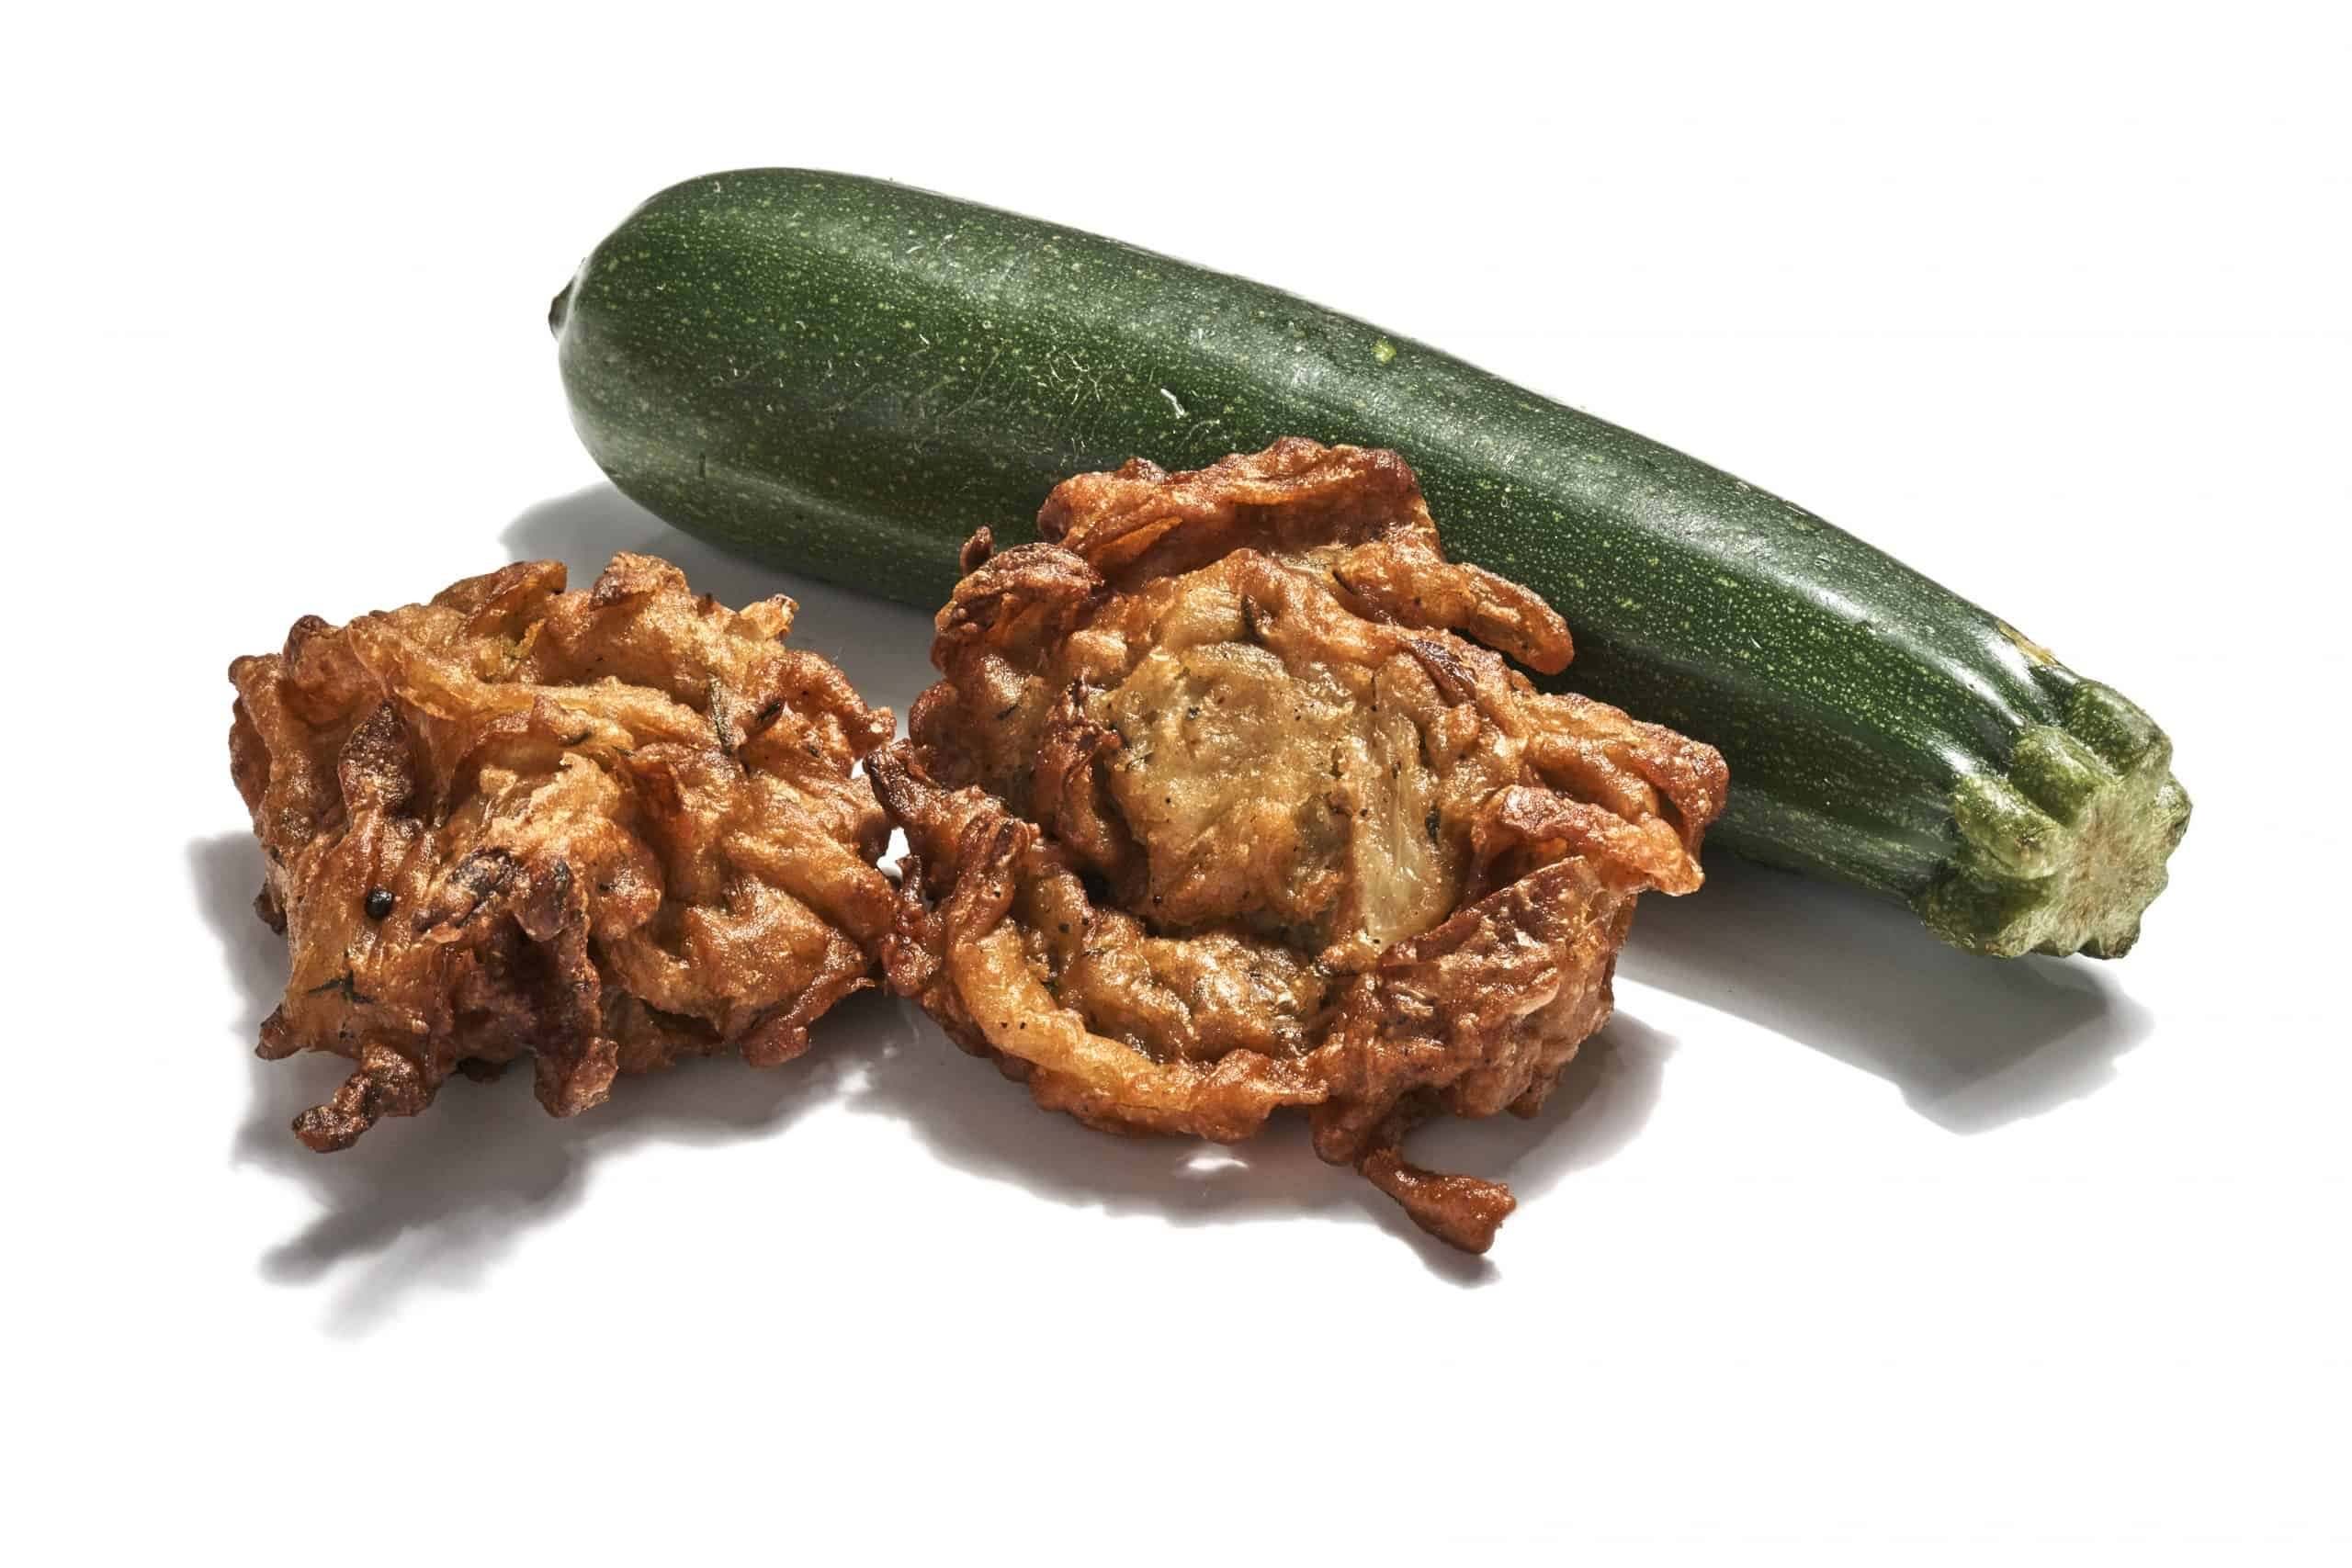 Courgette and onion Bhaji Gluten free Vegan